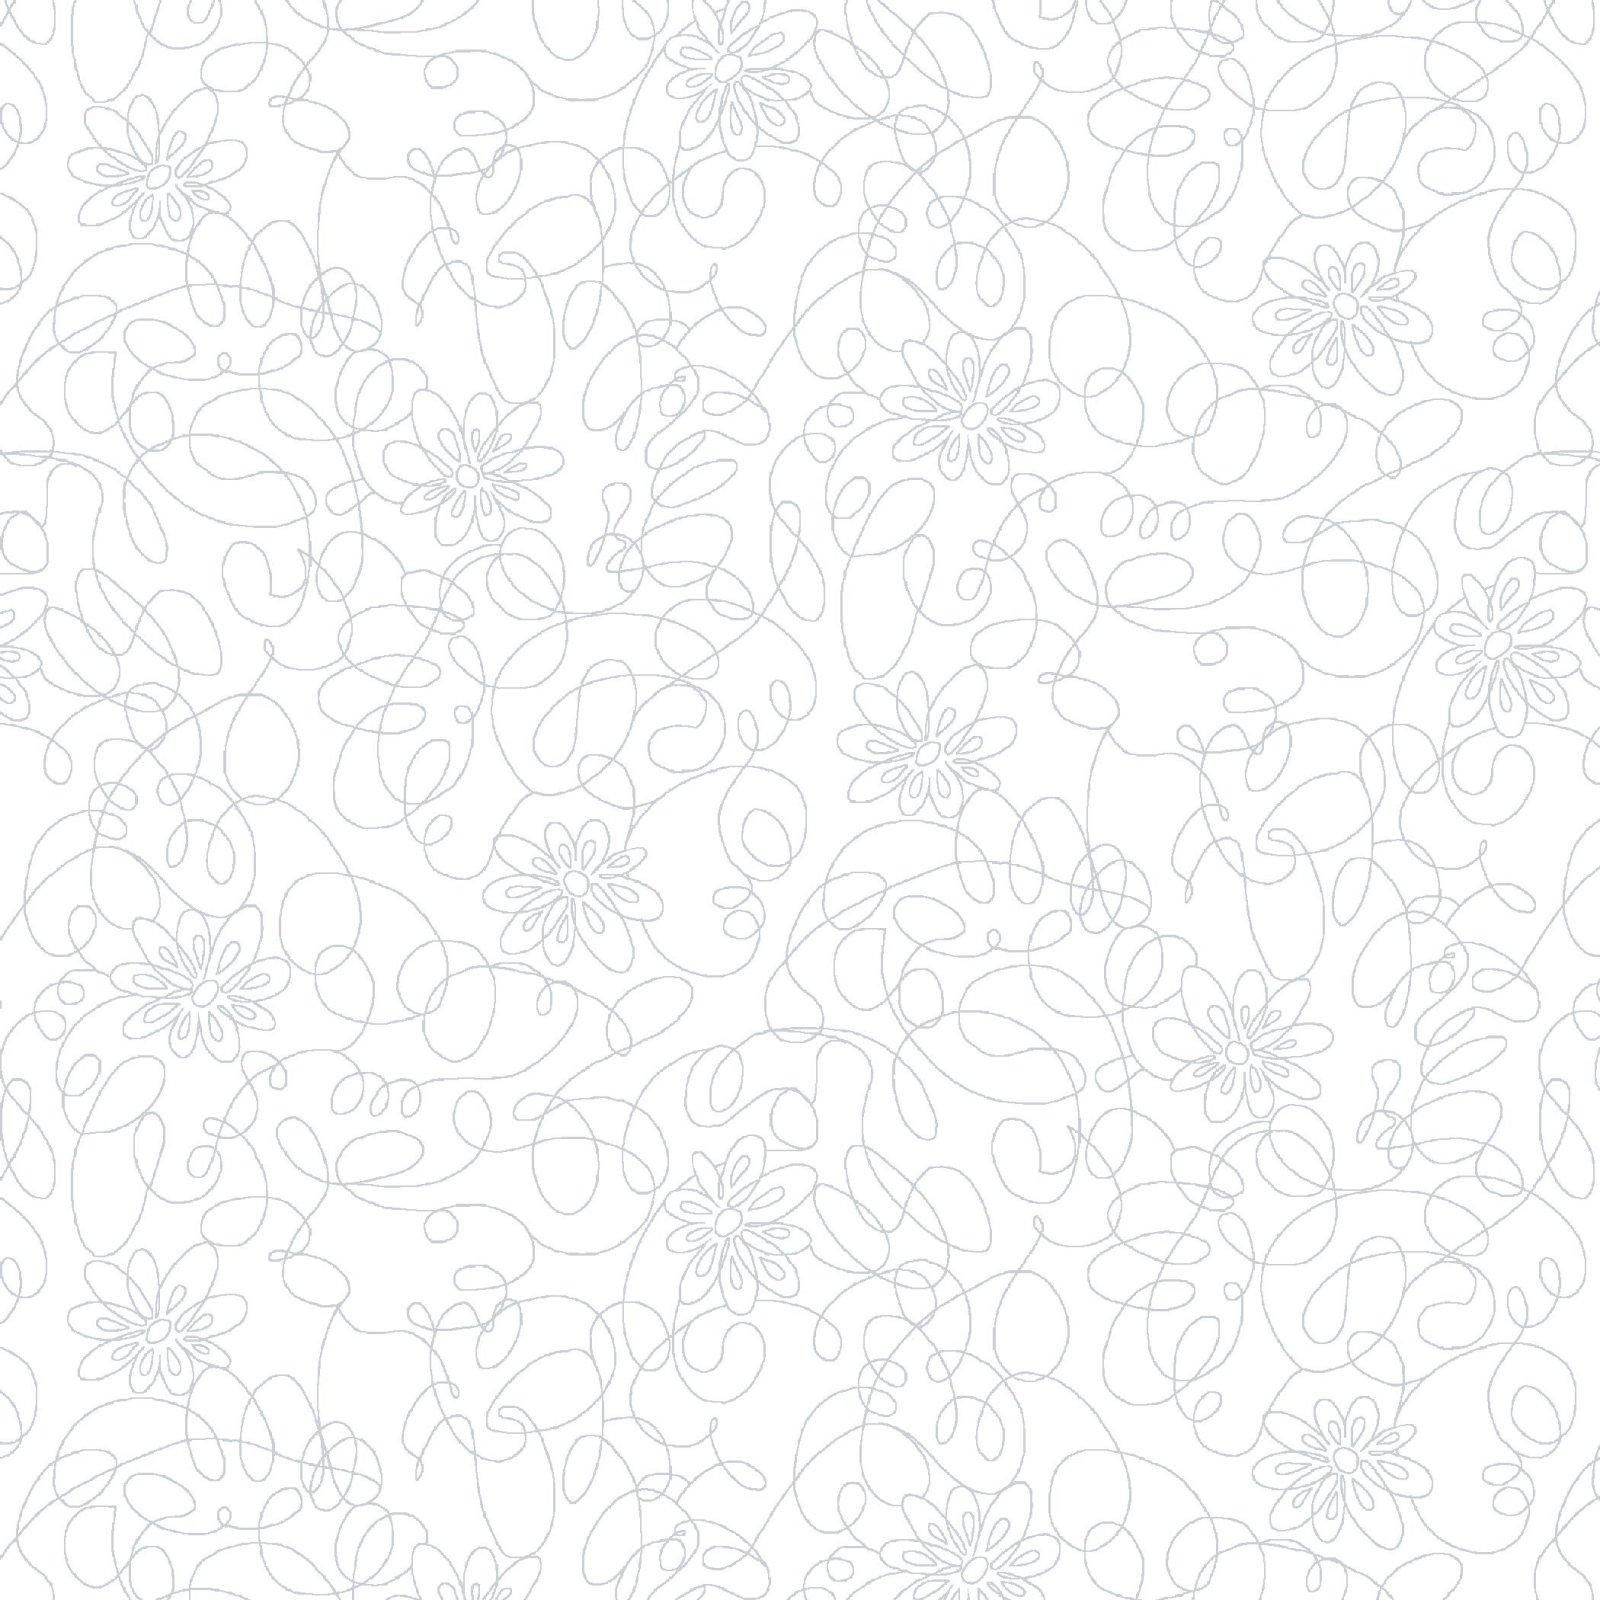 SE-Cream & Sugar X 6106-01W White on White - Scribble Flower